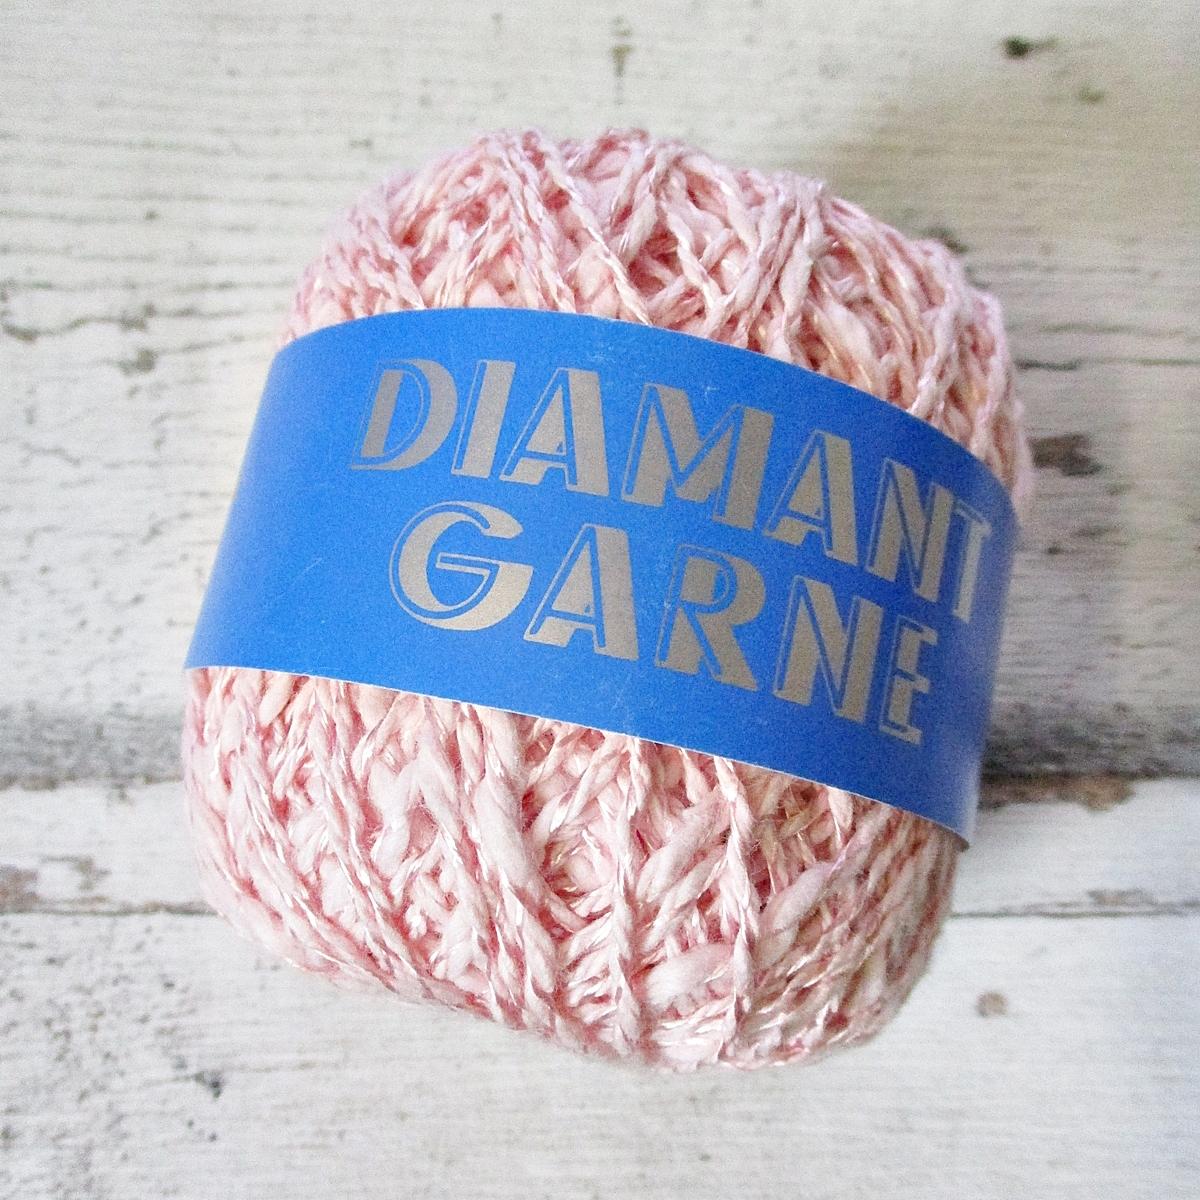 Wolle Diamantgarn Farbe_2033 rosa 66umwolle 34%Viskose Seidenglanz